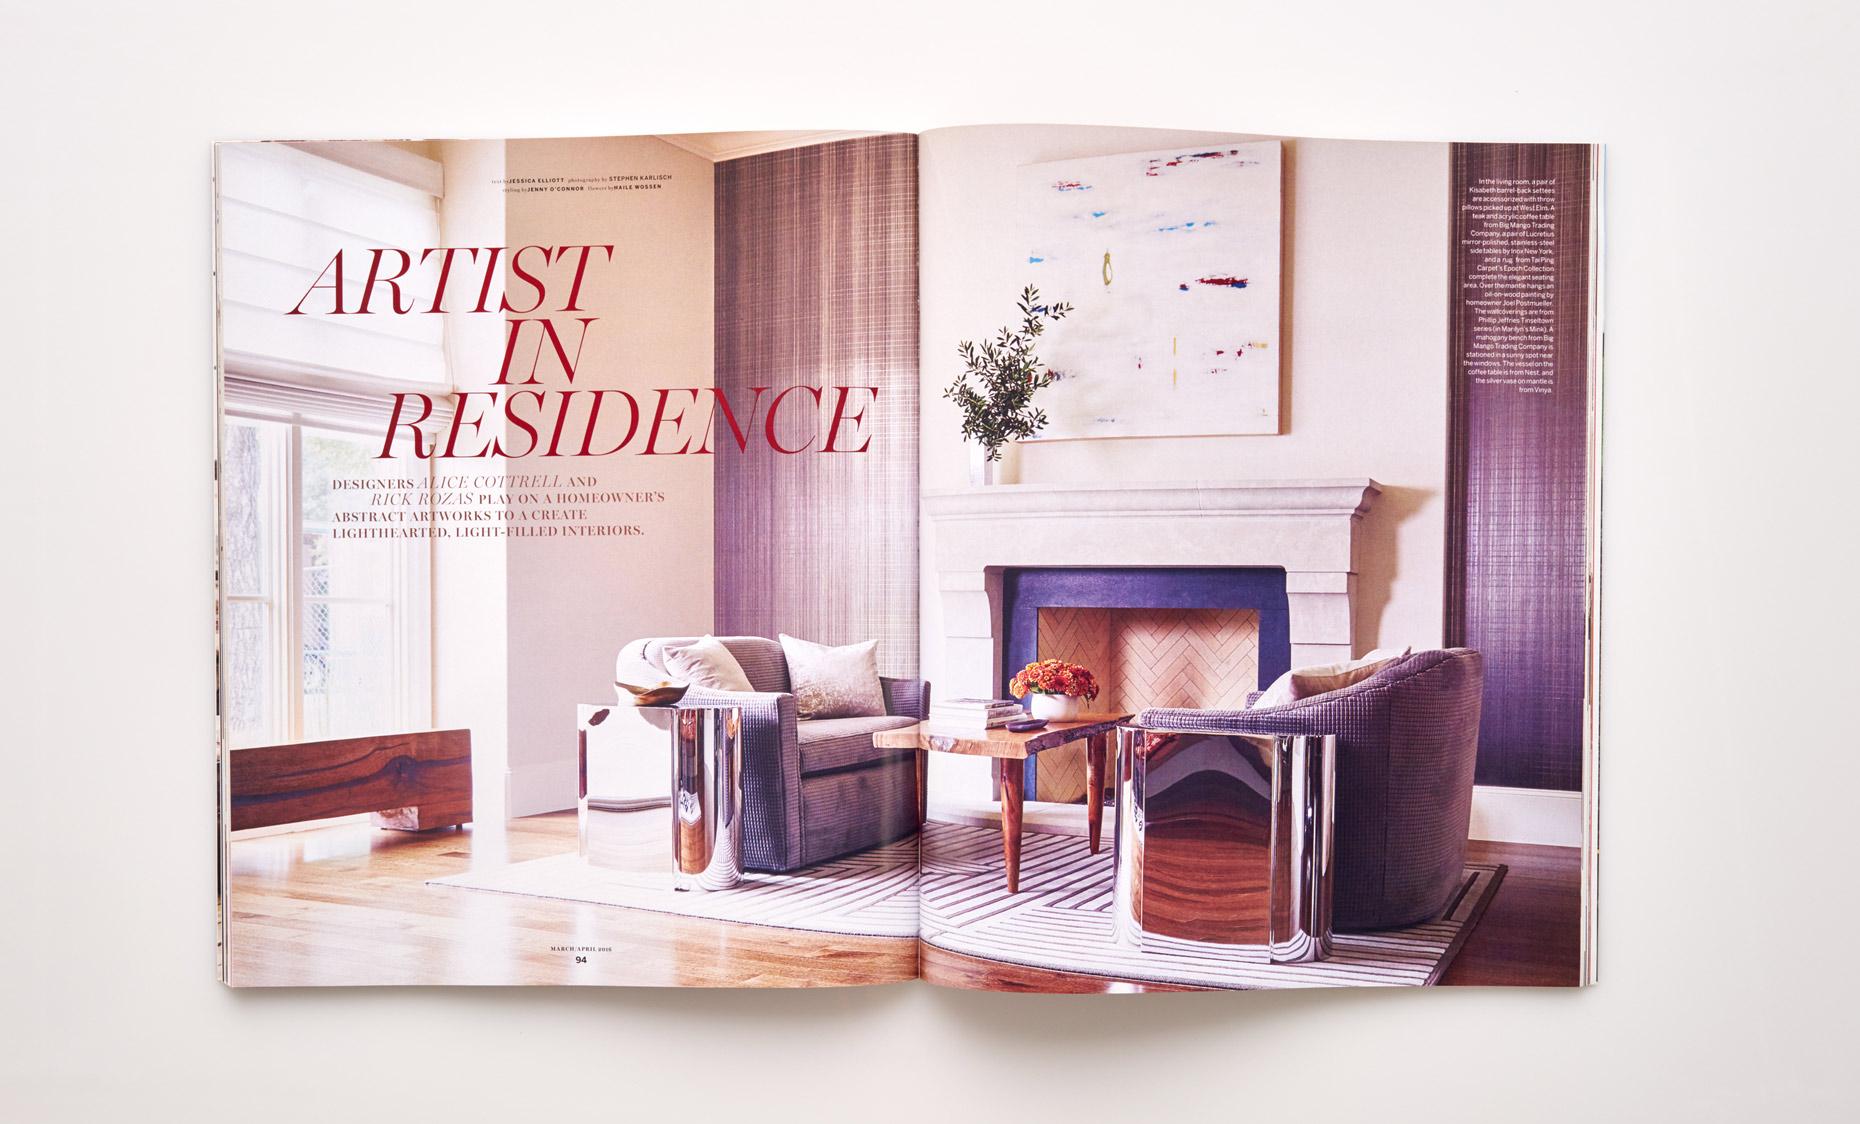 Stephen Karlisch D Home Artist In Residence Title Spread